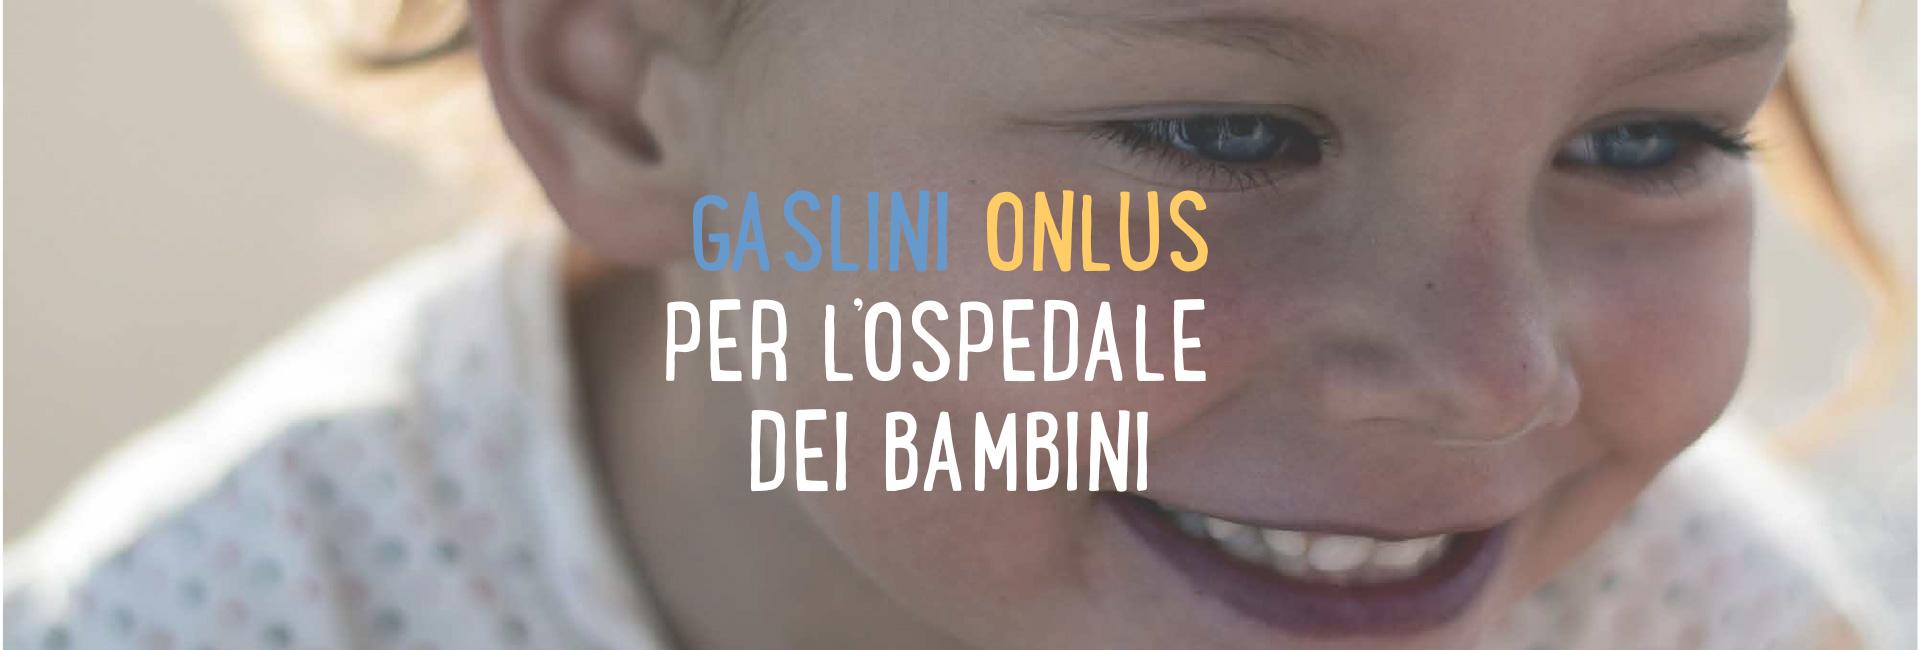 Gaslini Onlus